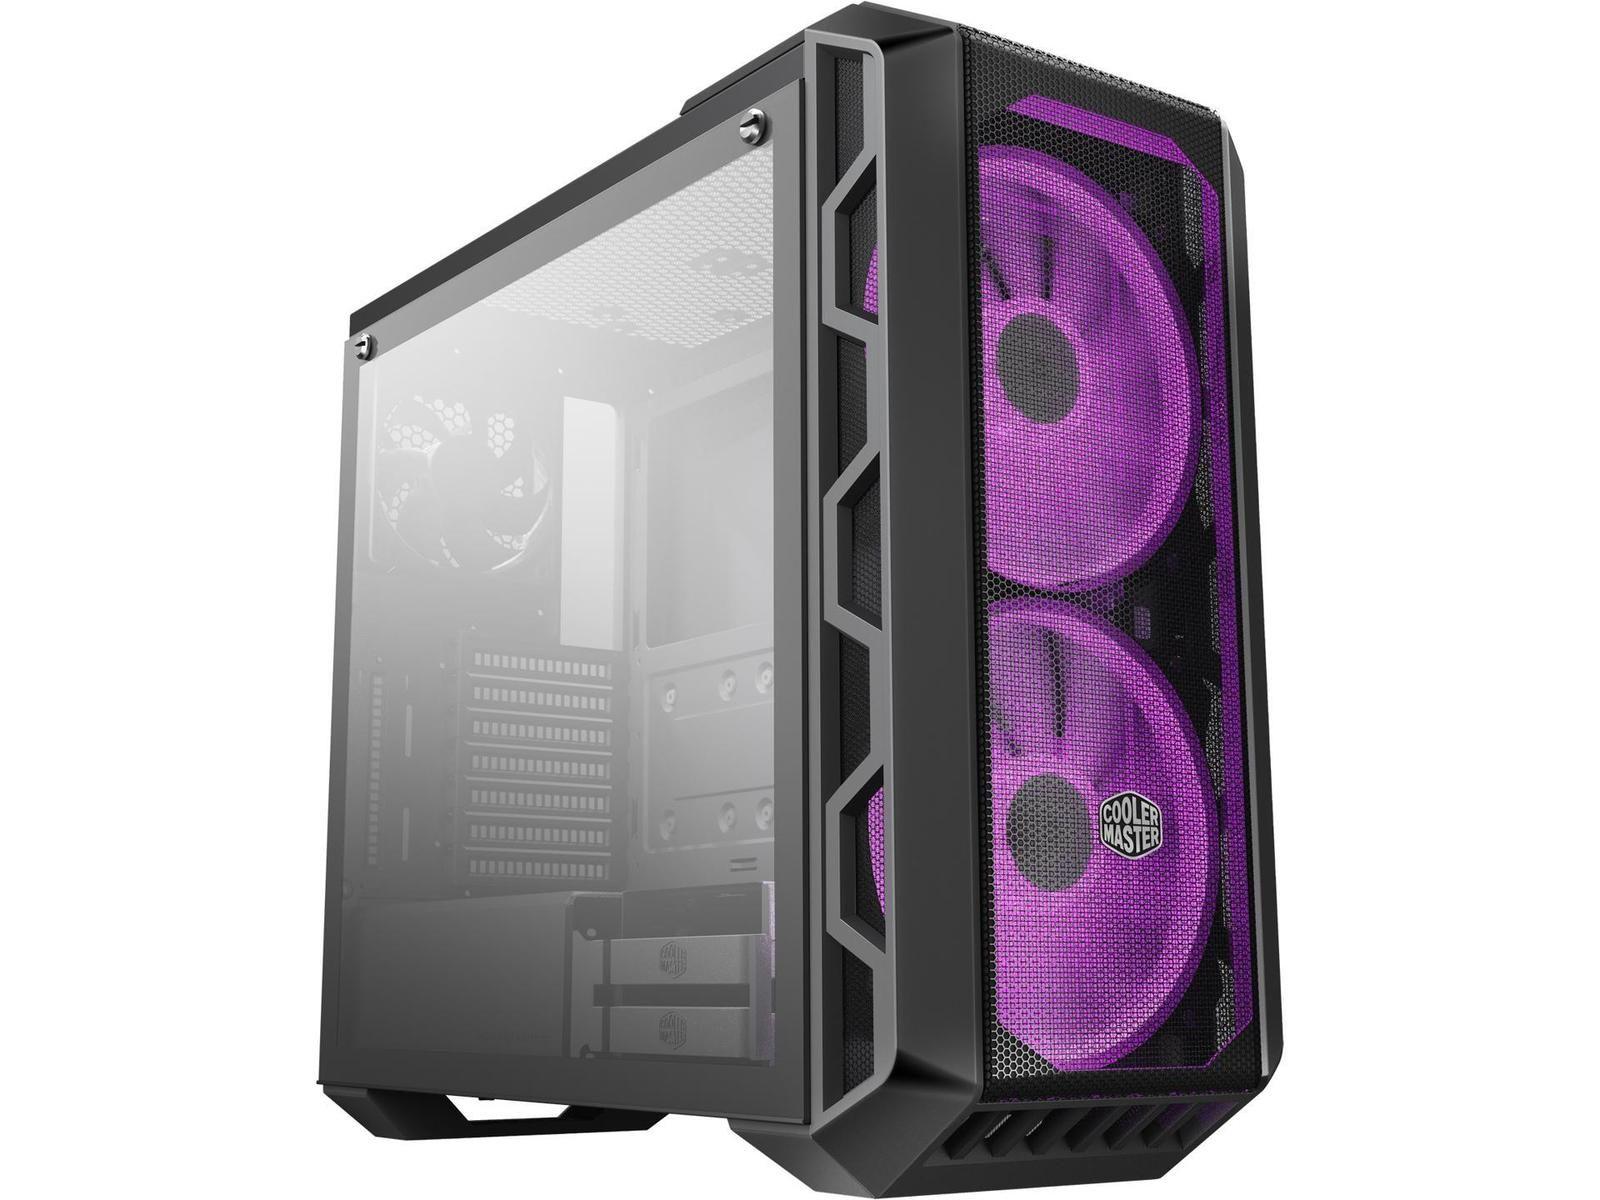 Cooler Master Mastercase H500 Atx Mid Tower Case Mcm H500 Ignn S00 Pcpartpicker Cooler Master Panel Siding Airflow